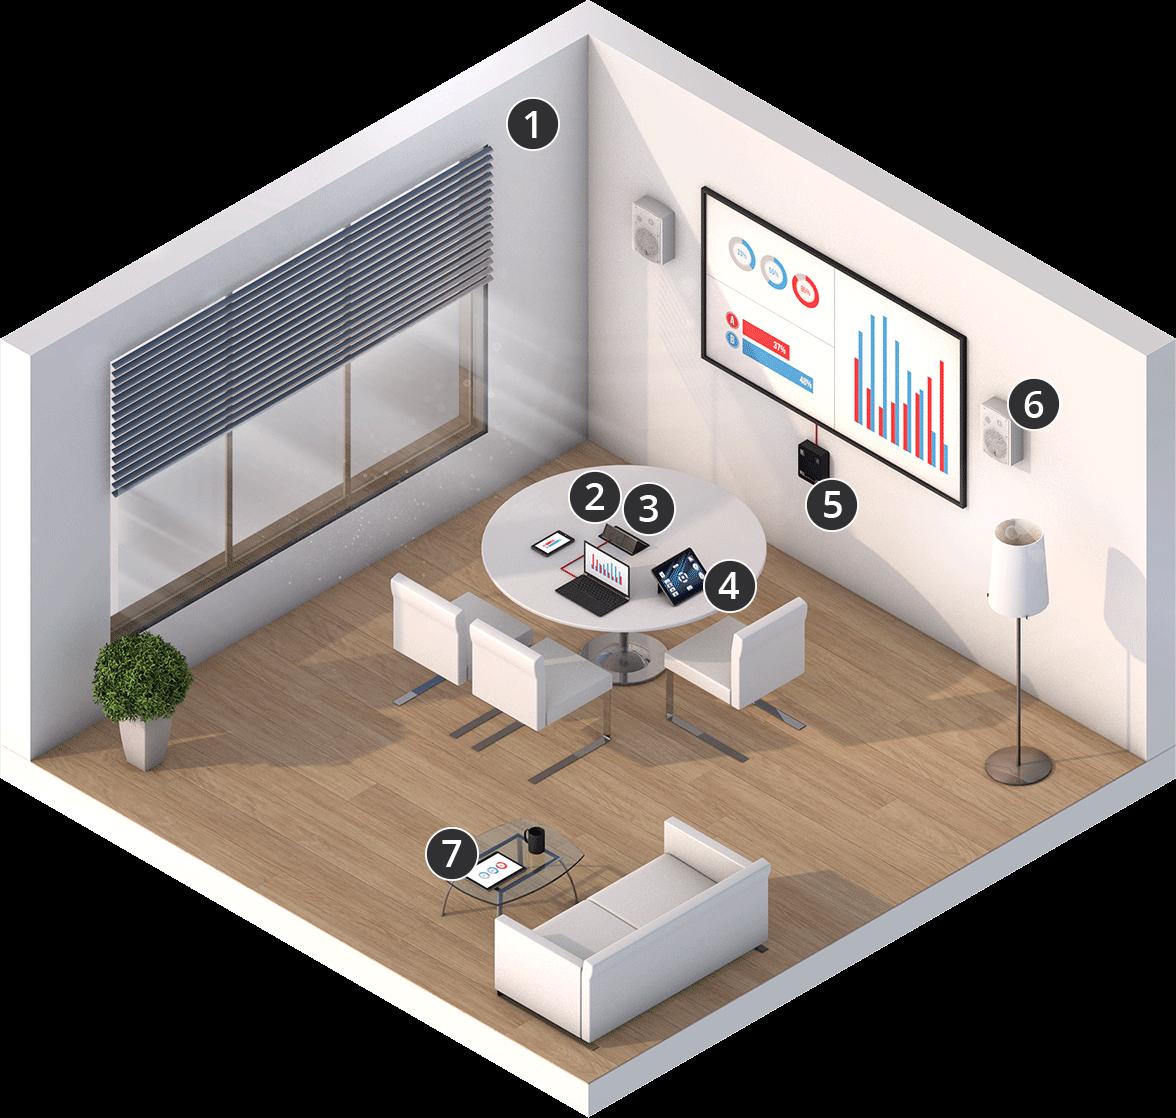 Floor clipart plain room. Business corporate control panel